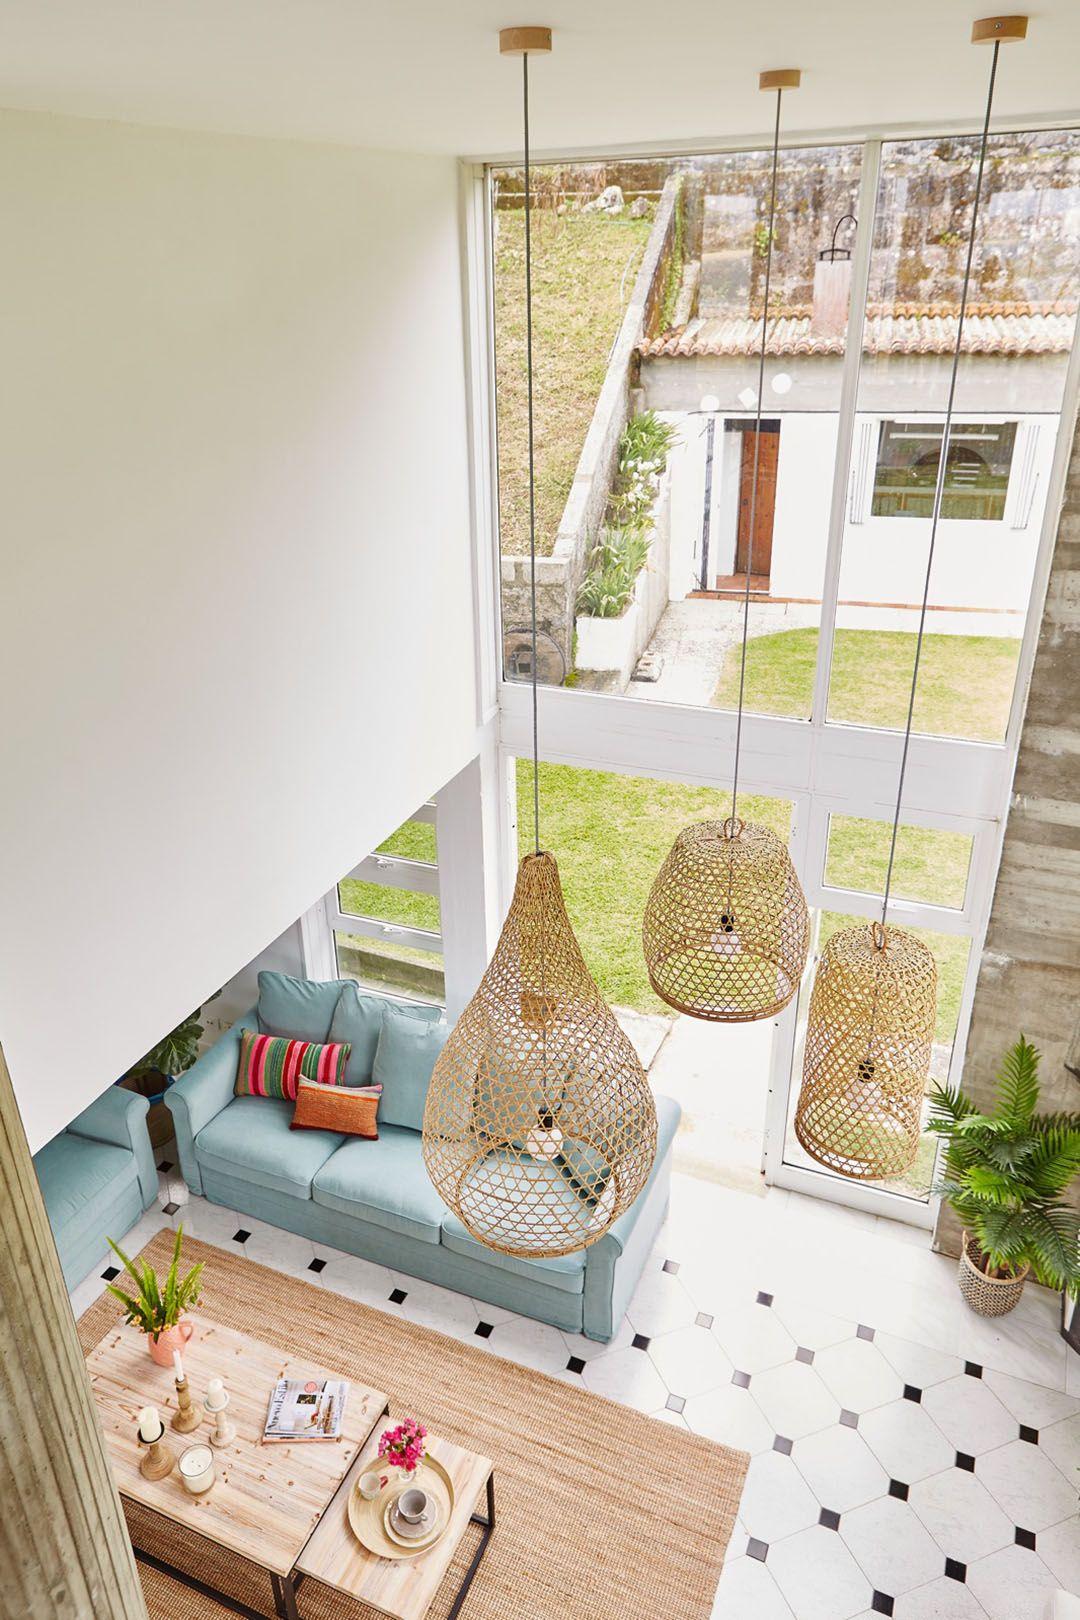 Abracadabra Decor Vigo Home Staging decora para vender o alquilar casa de vacaciones - una iluminación espectacular